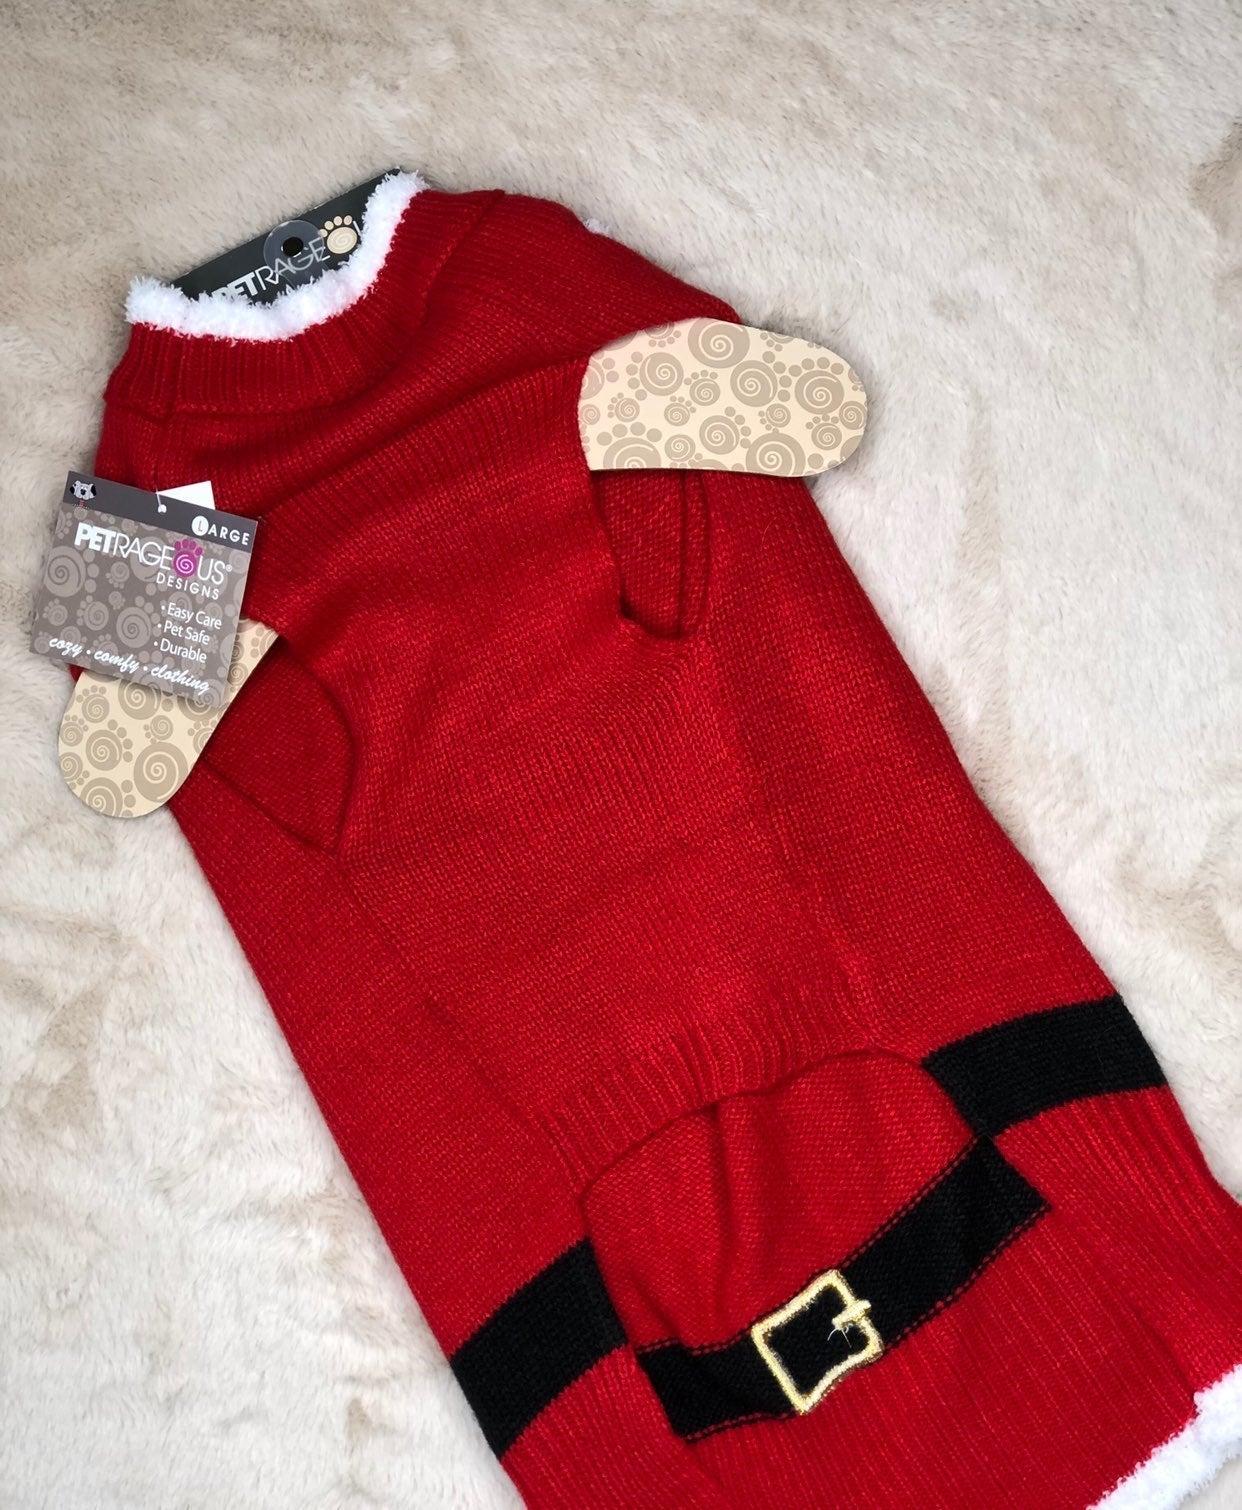 Santa Paws Dog sweater large